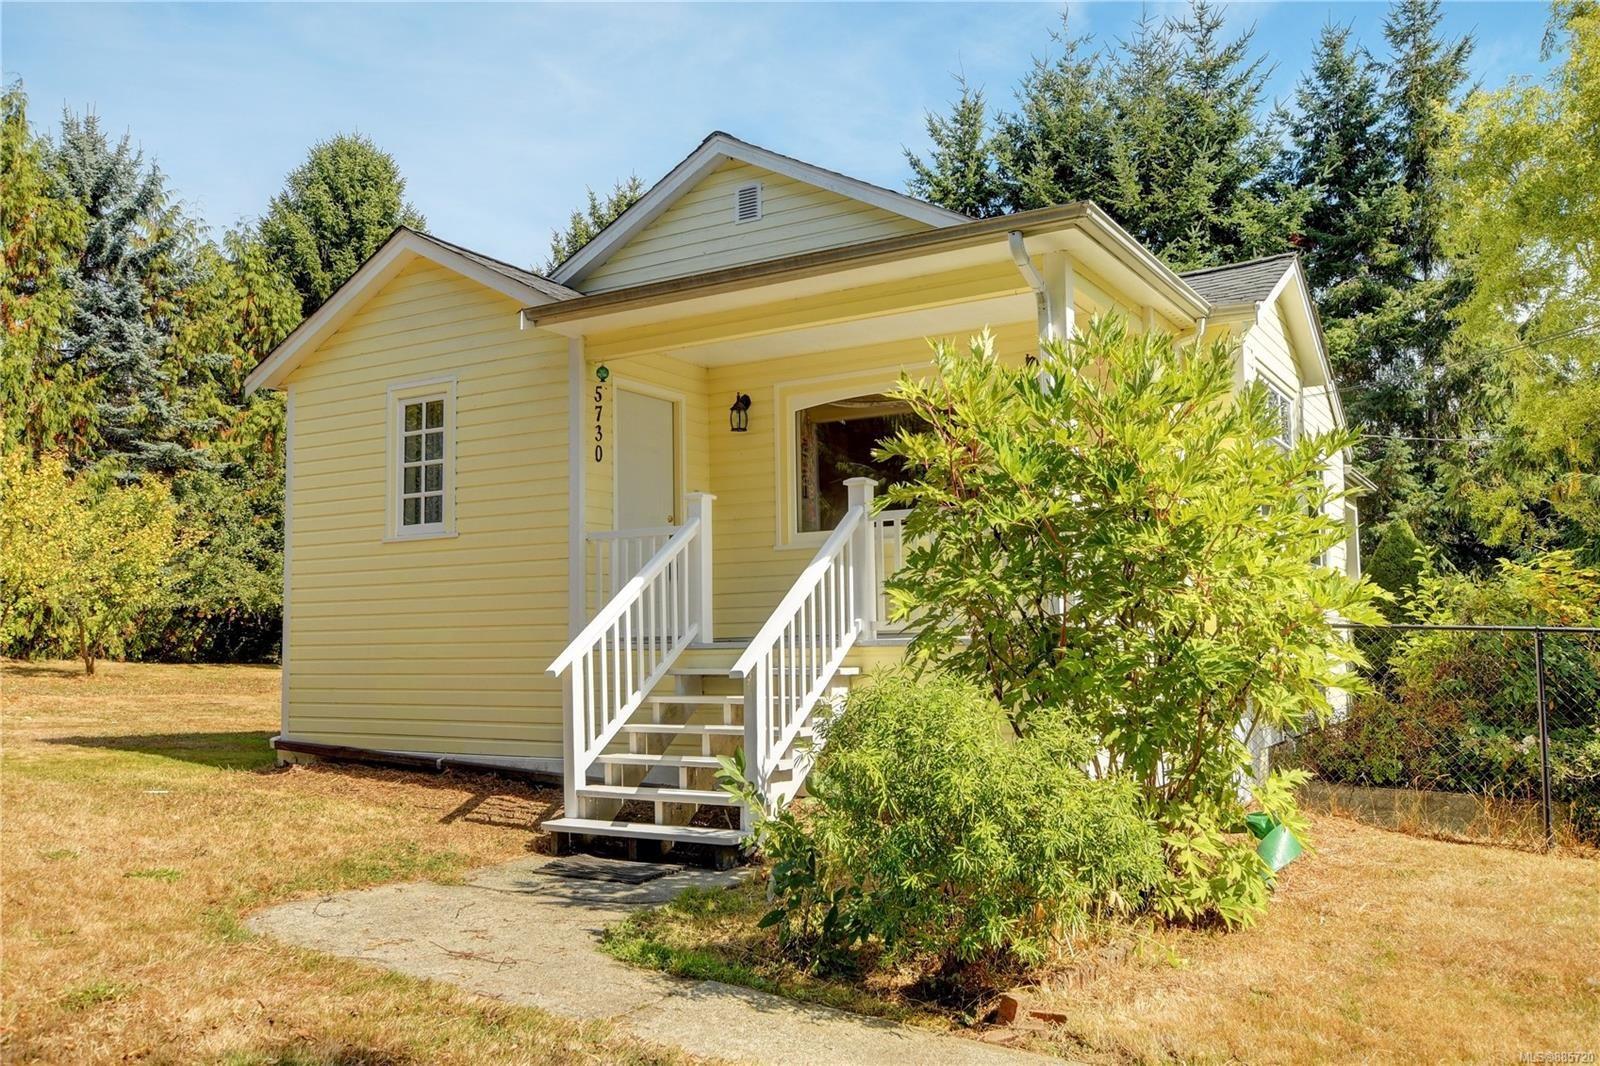 Main Photo: 5730 Siasong Rd in : Sk Saseenos House for sale (Sooke)  : MLS®# 885720